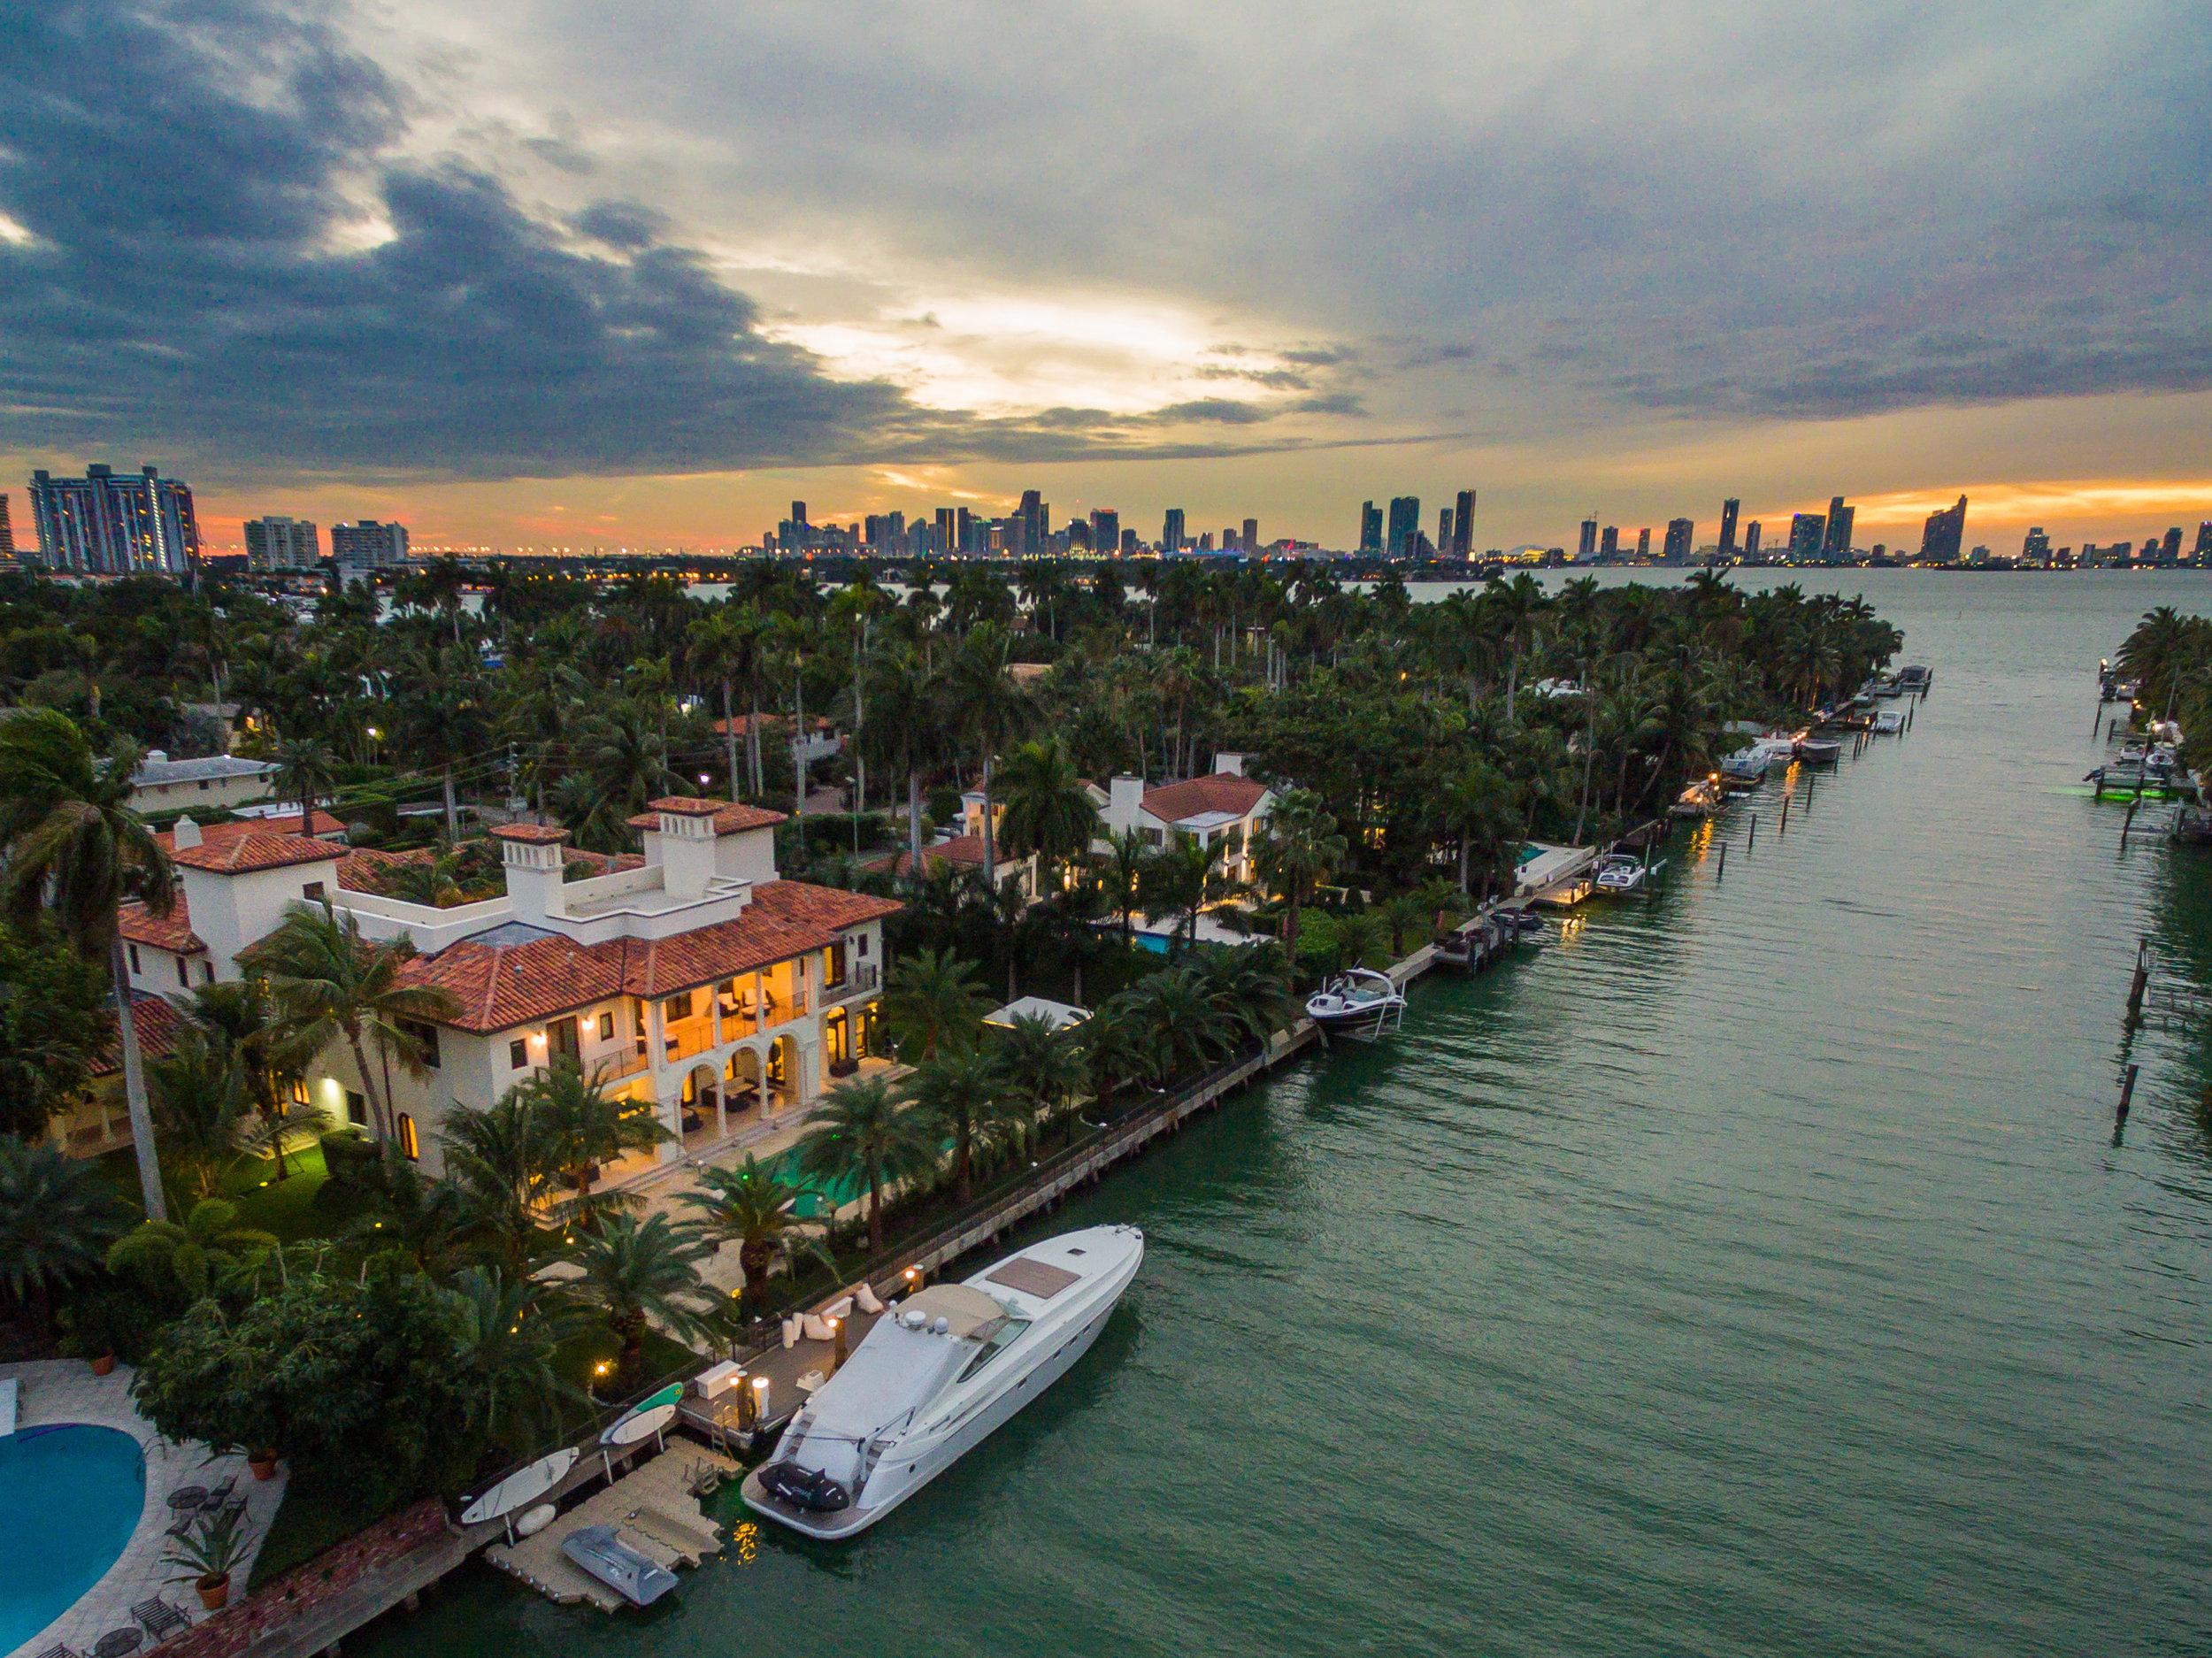 Tour This Rare Mediterranean Bayfront Estate On Miami Beach's Exclusive Sunset Islands